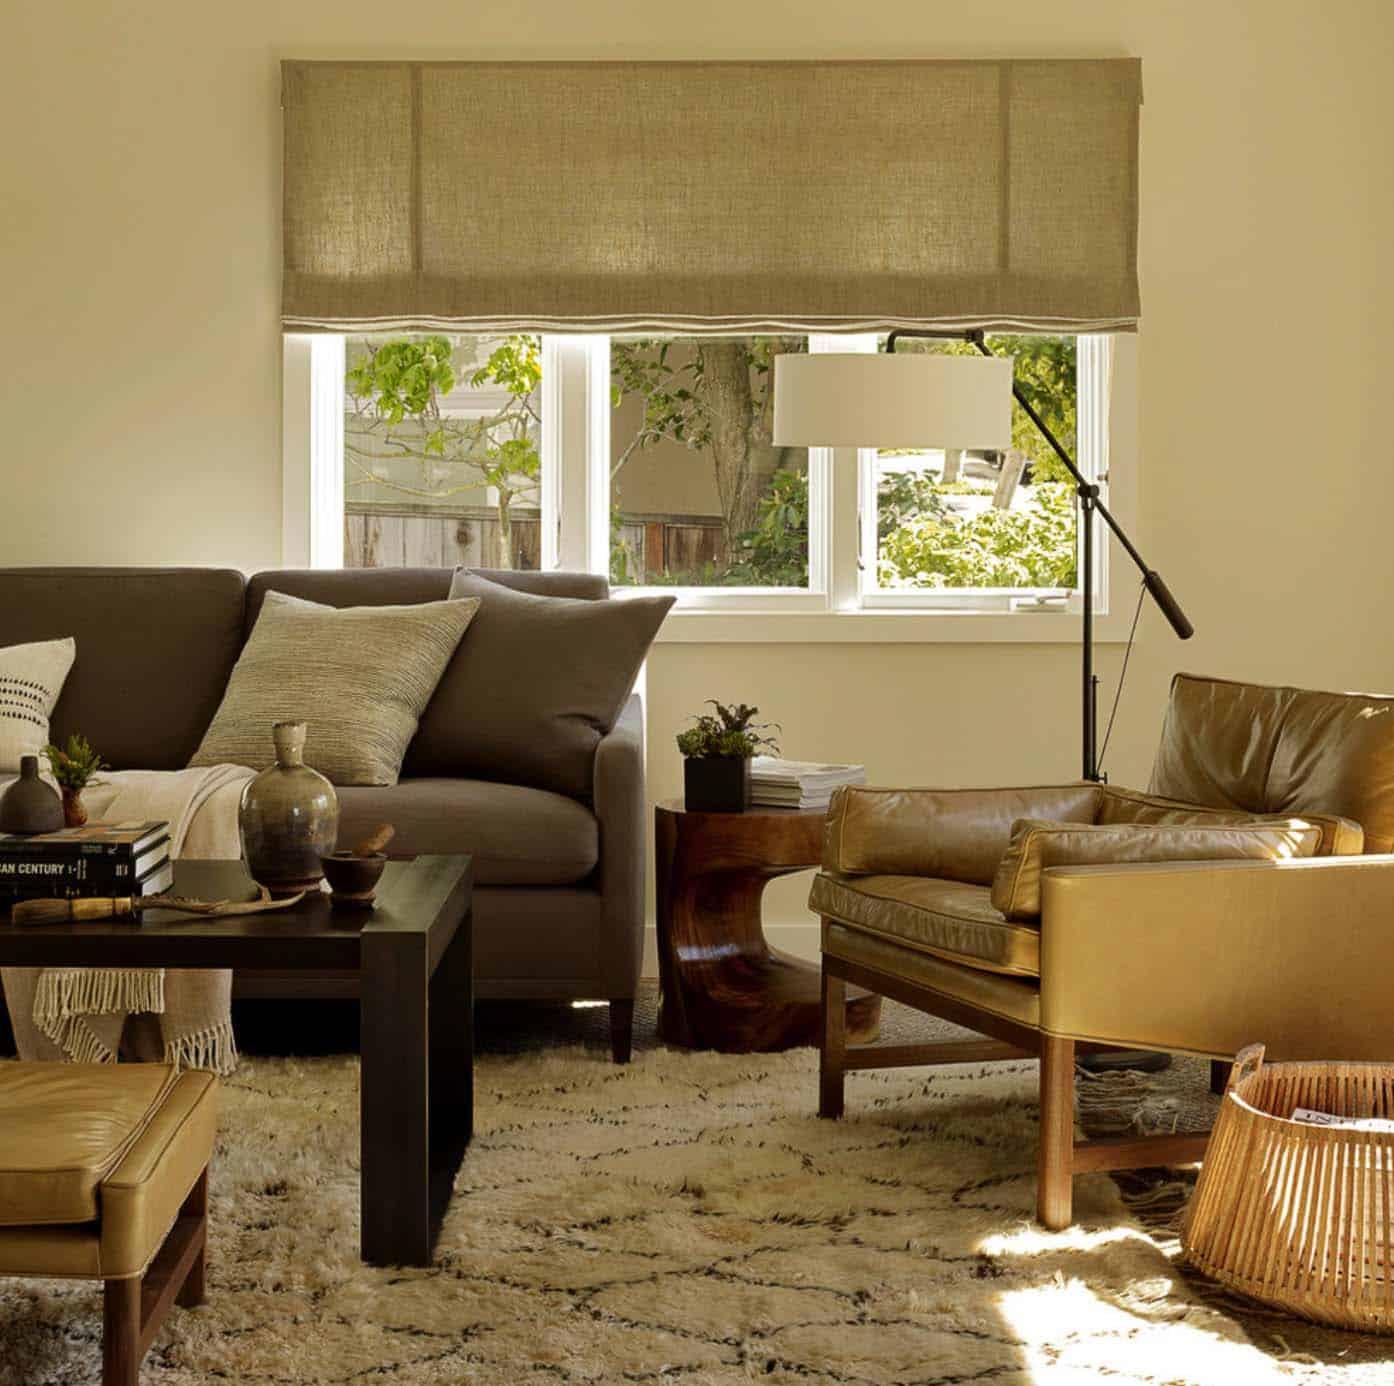 Design d'intérieur contemporain-Jute Interior Design-03-1 Kindesign